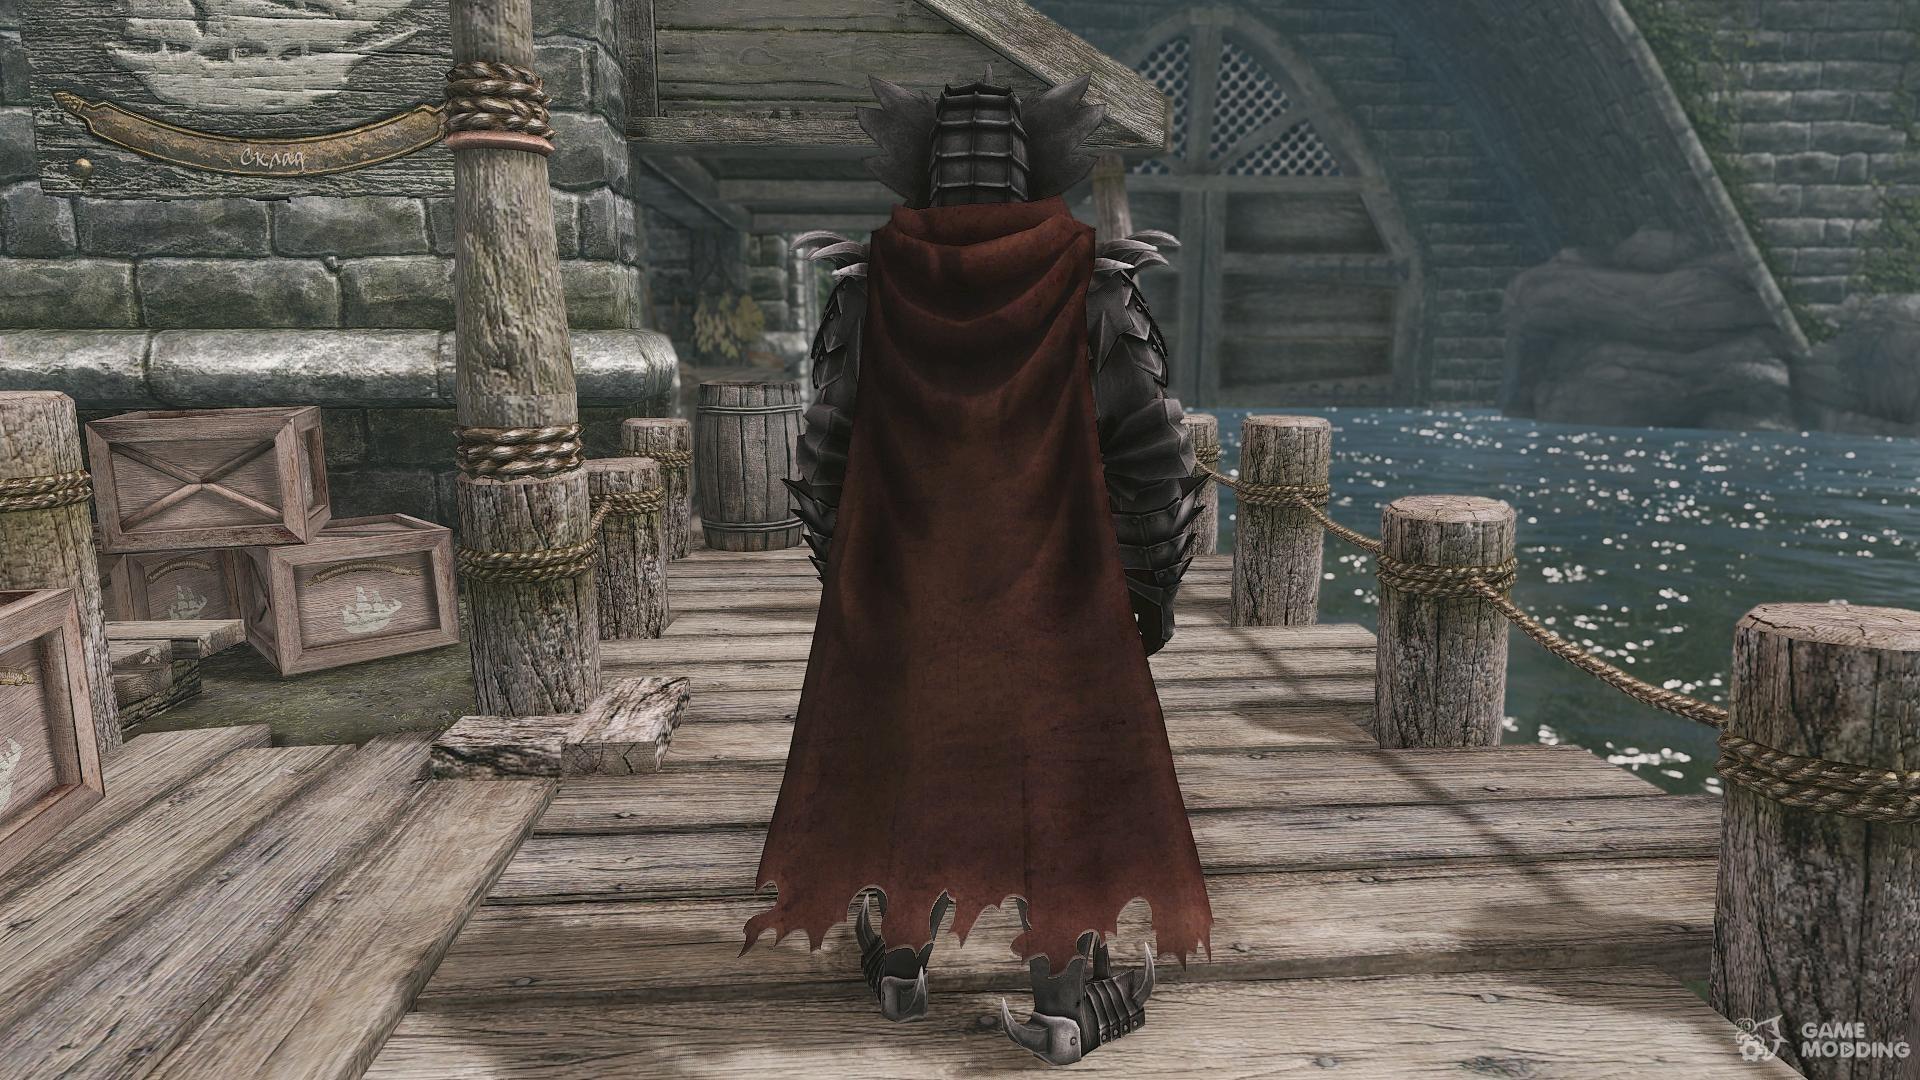 skyrim xbox 360 how to get daedric armor